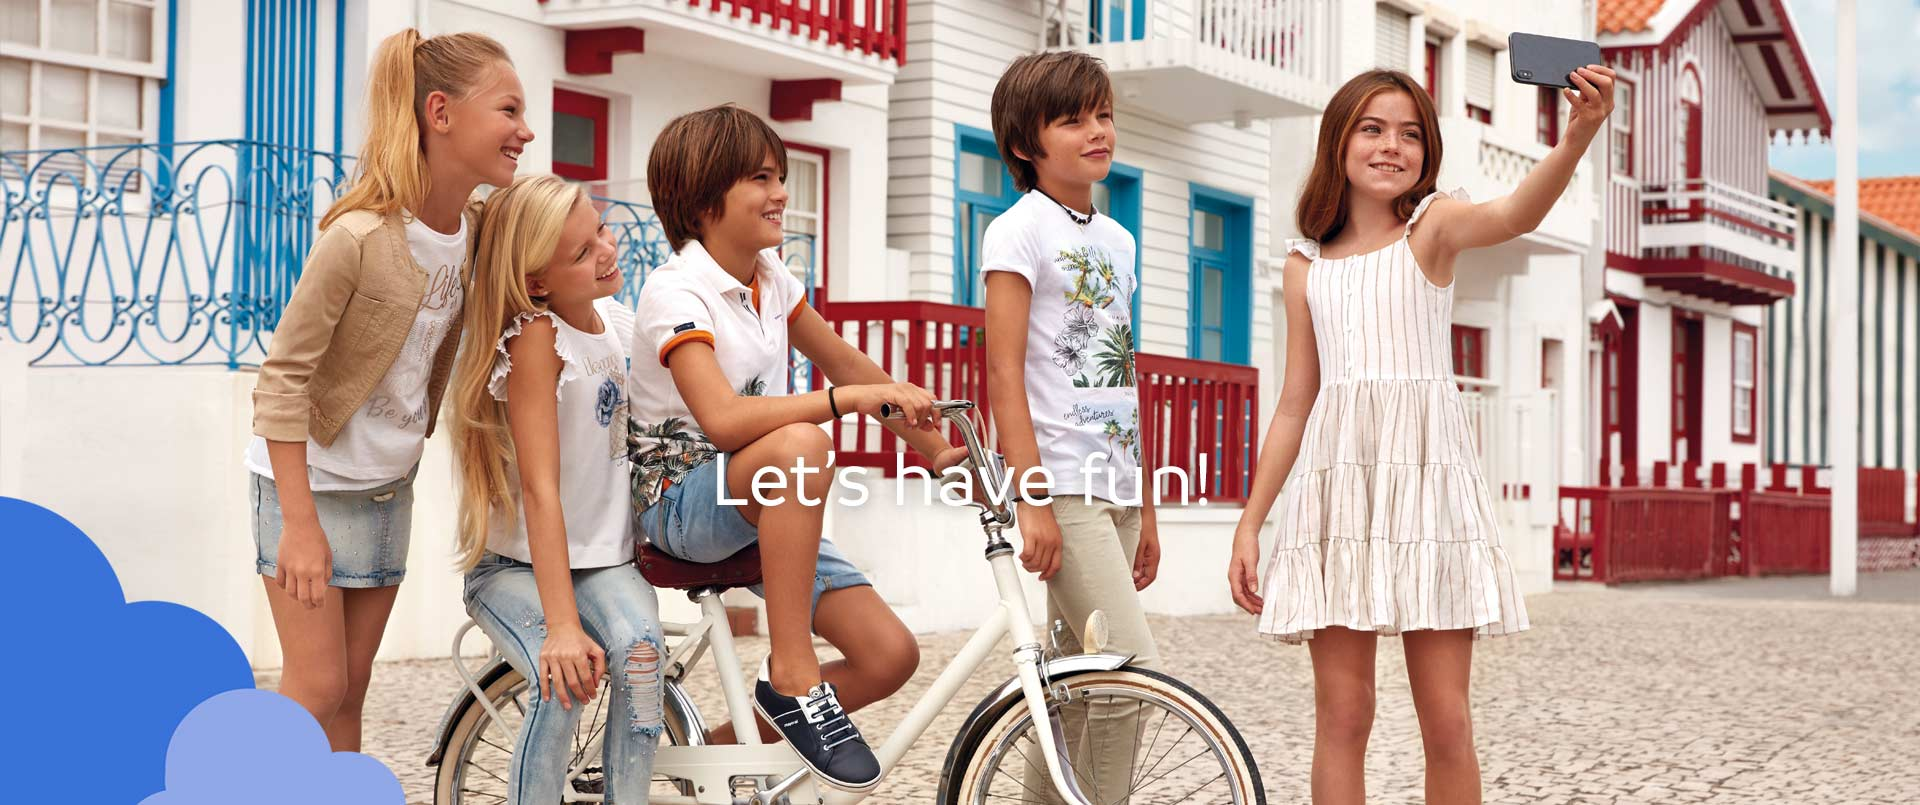 0ba144e6a05 Παιδική μόδα, ρούχα για μωρό, αγόρι και κορίτσι | Mayoral